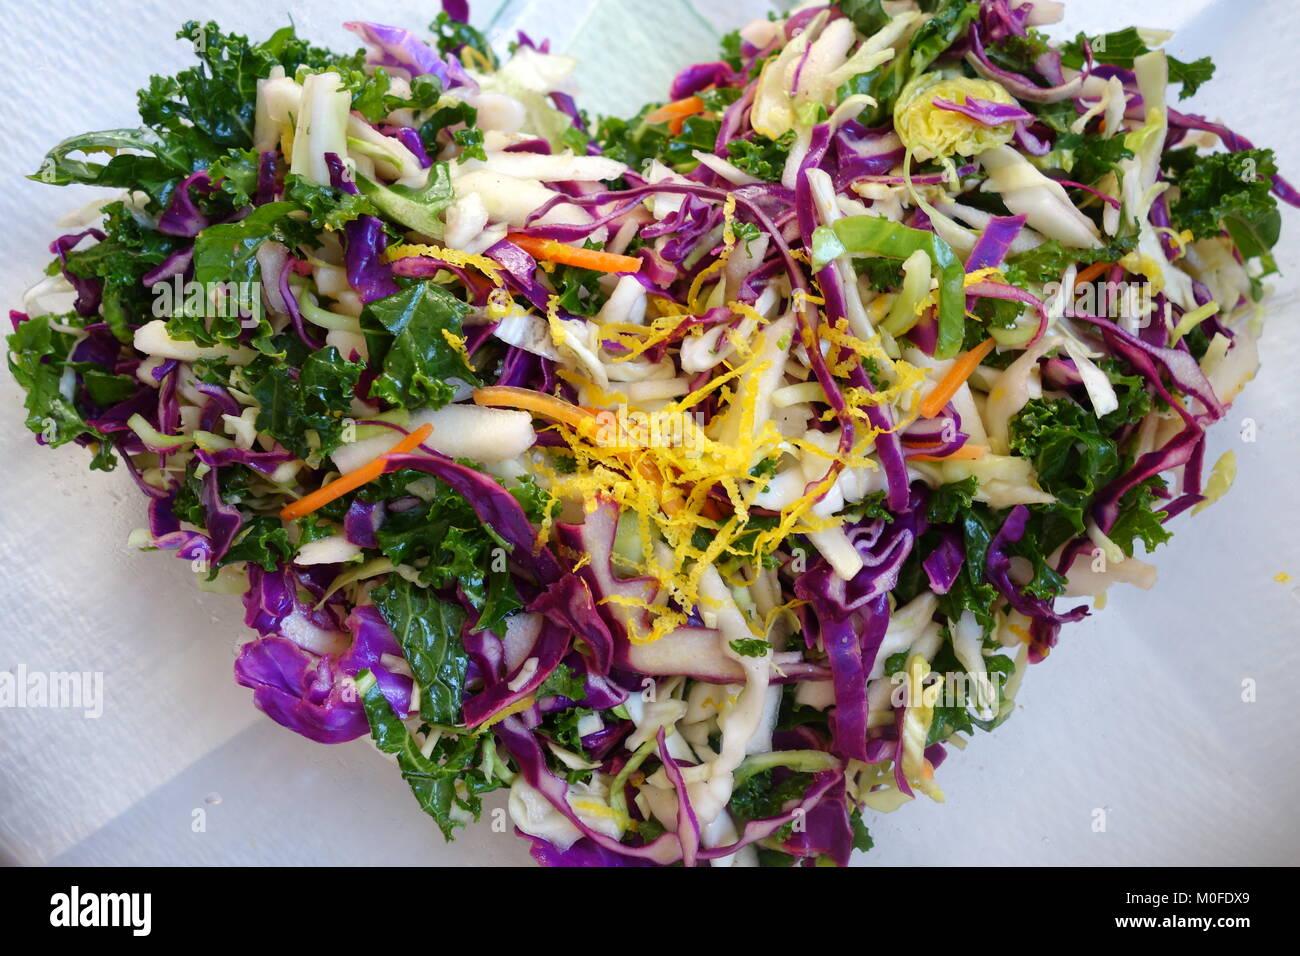 Herzförmige bunt gemischtes Gemüse Stockbild